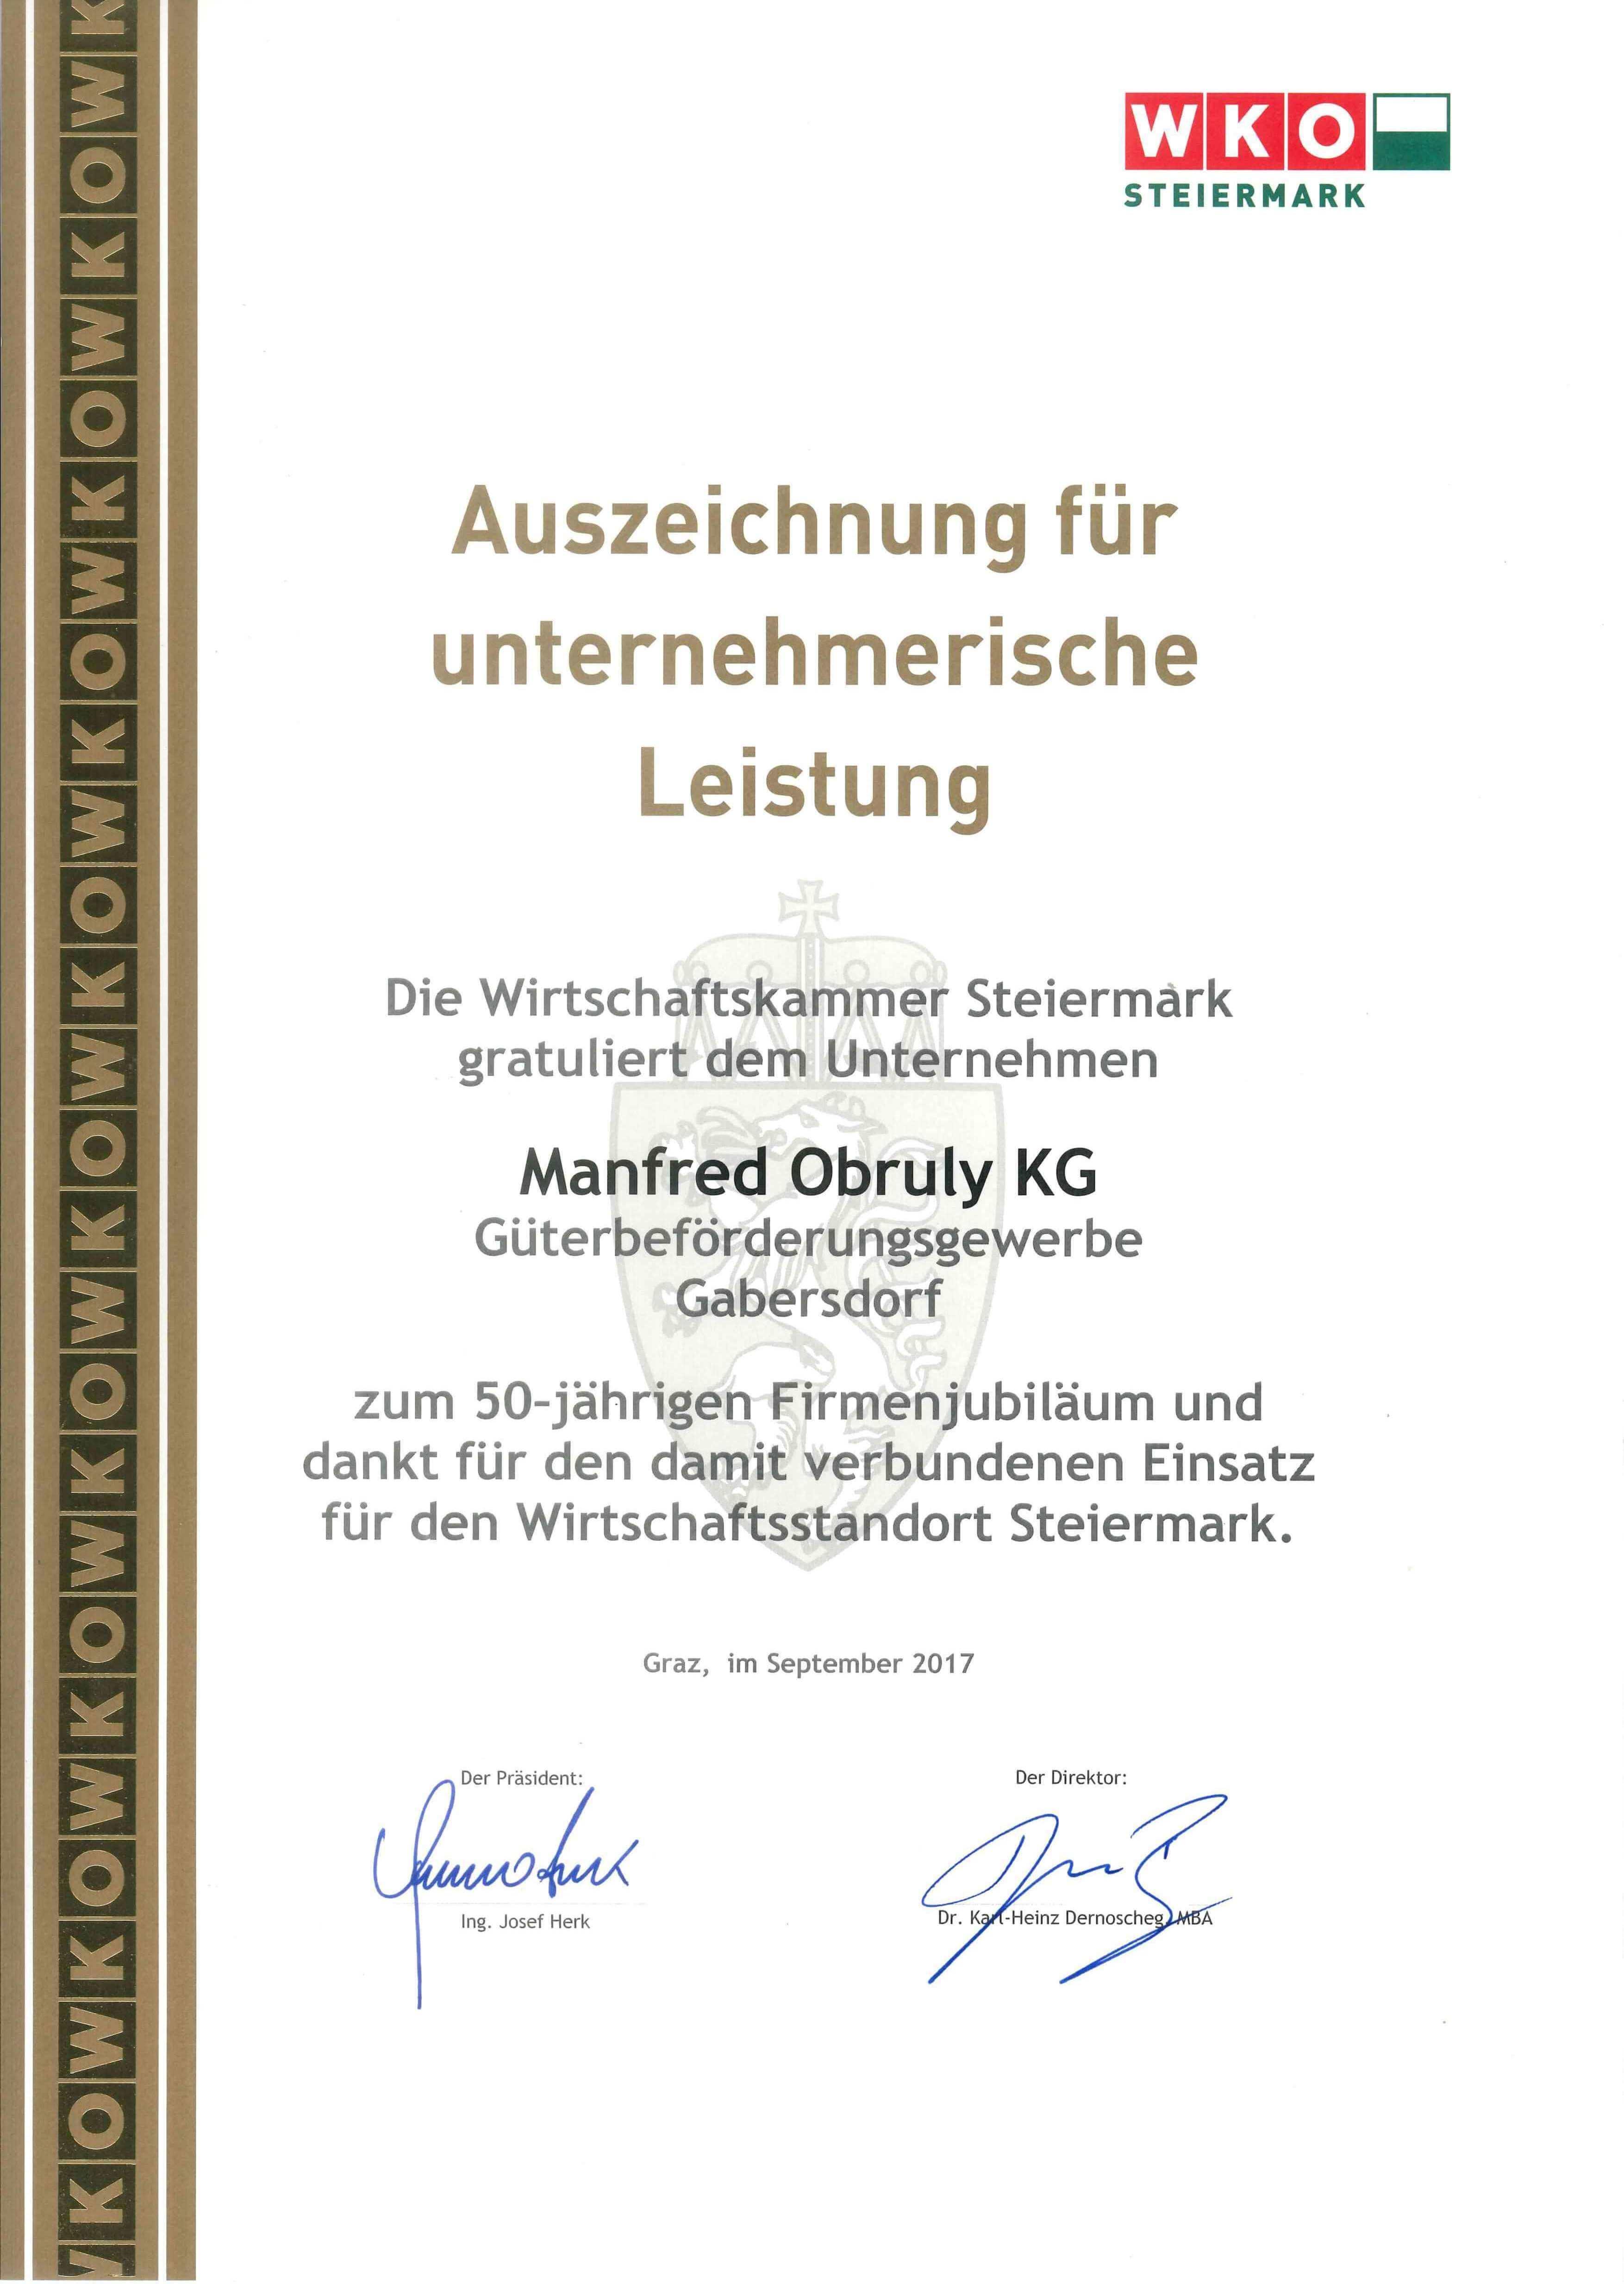 Urkunde_Firmenjubiläum